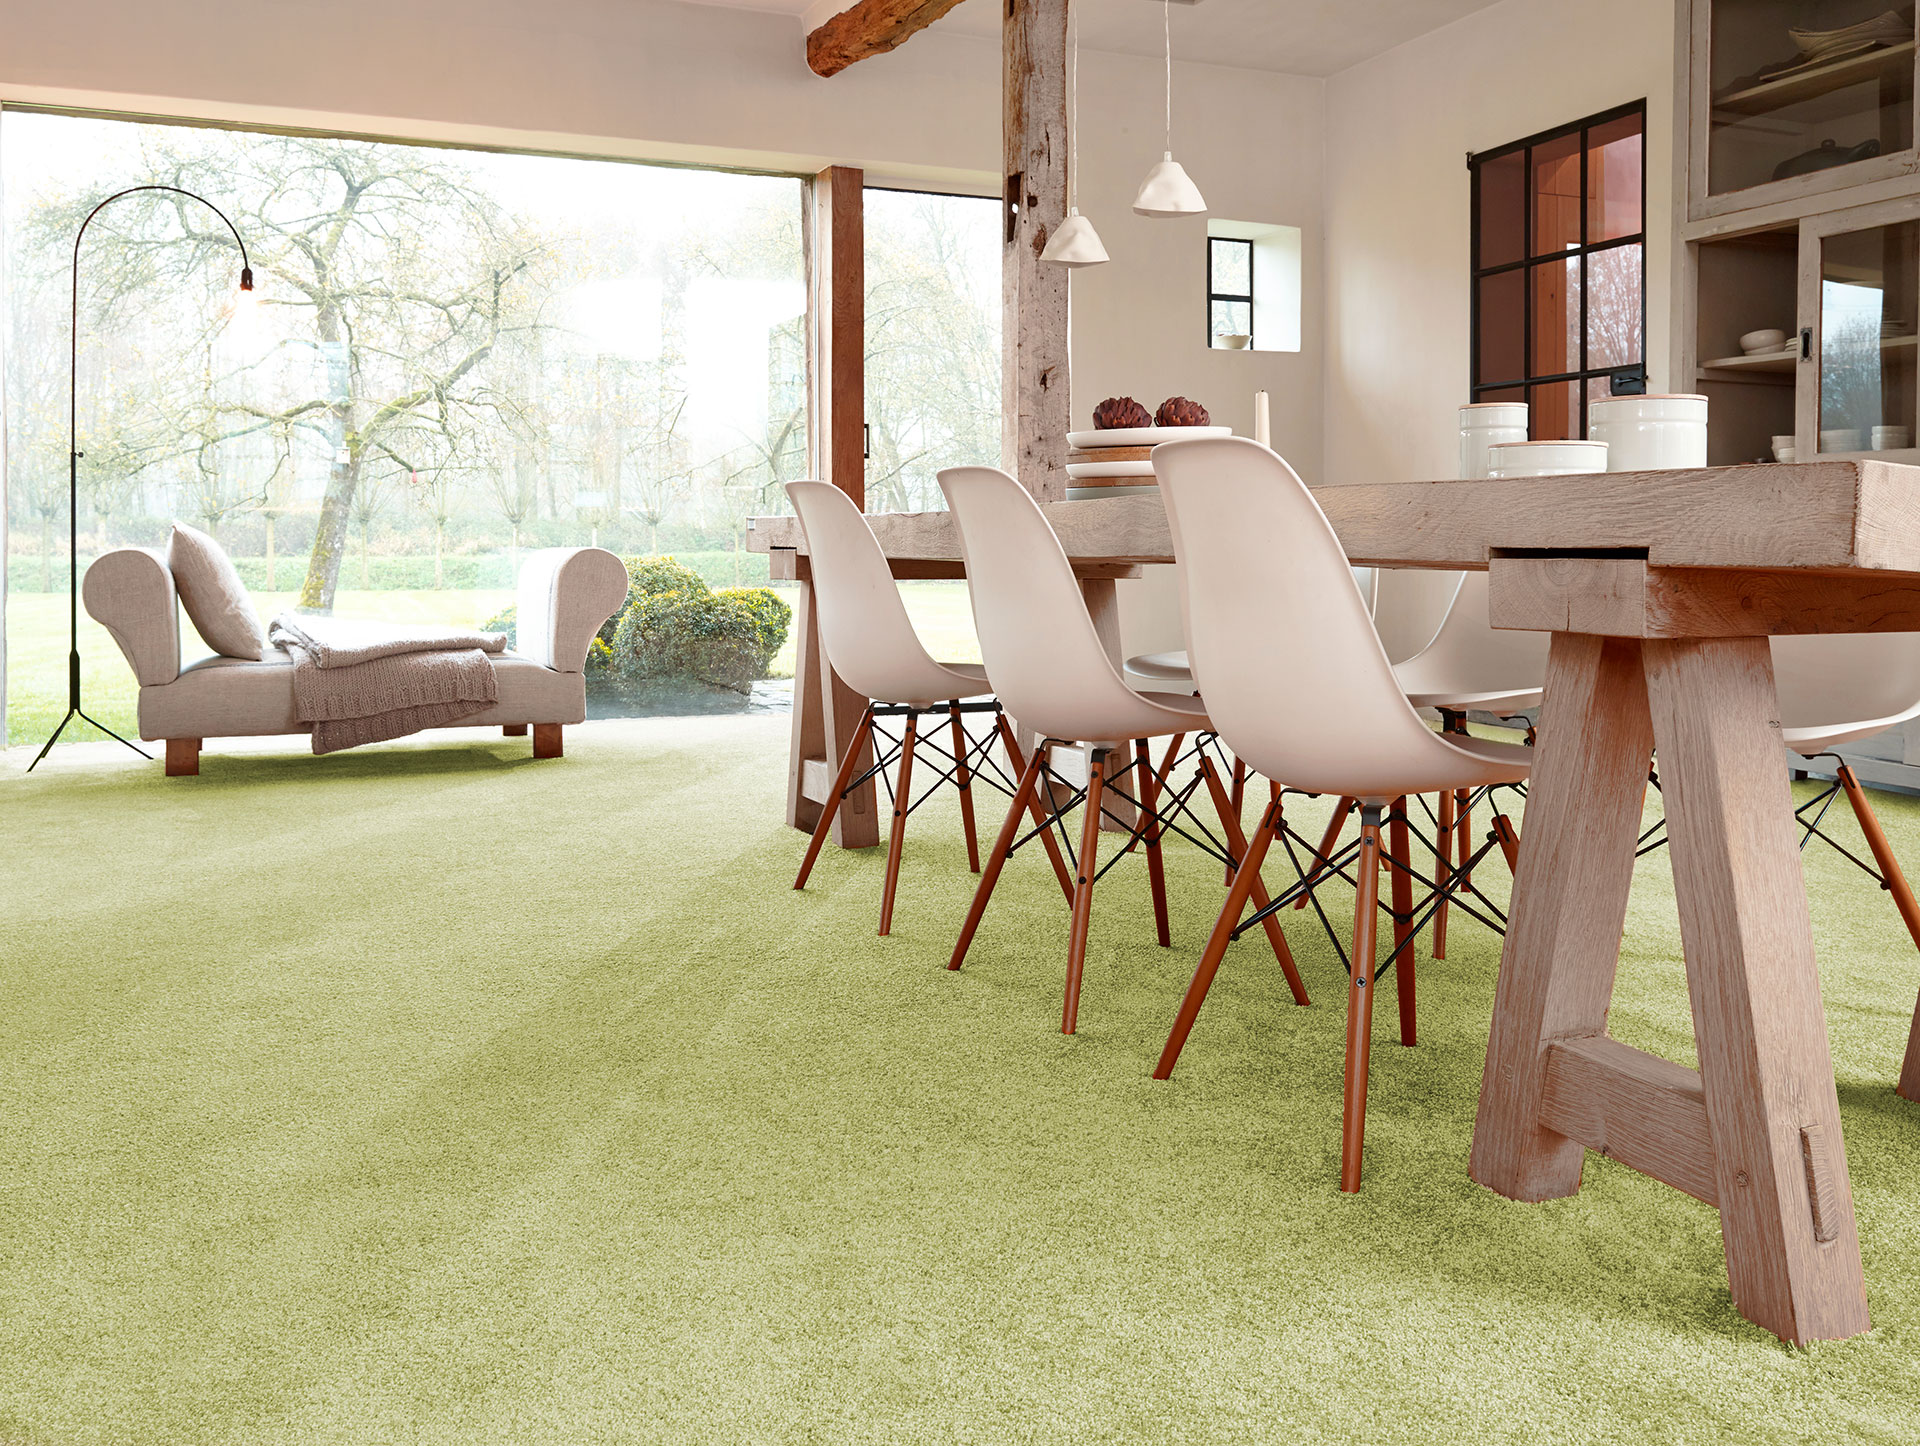 teppich verlegen lassen profi teppichverleger d sseldorf. Black Bedroom Furniture Sets. Home Design Ideas